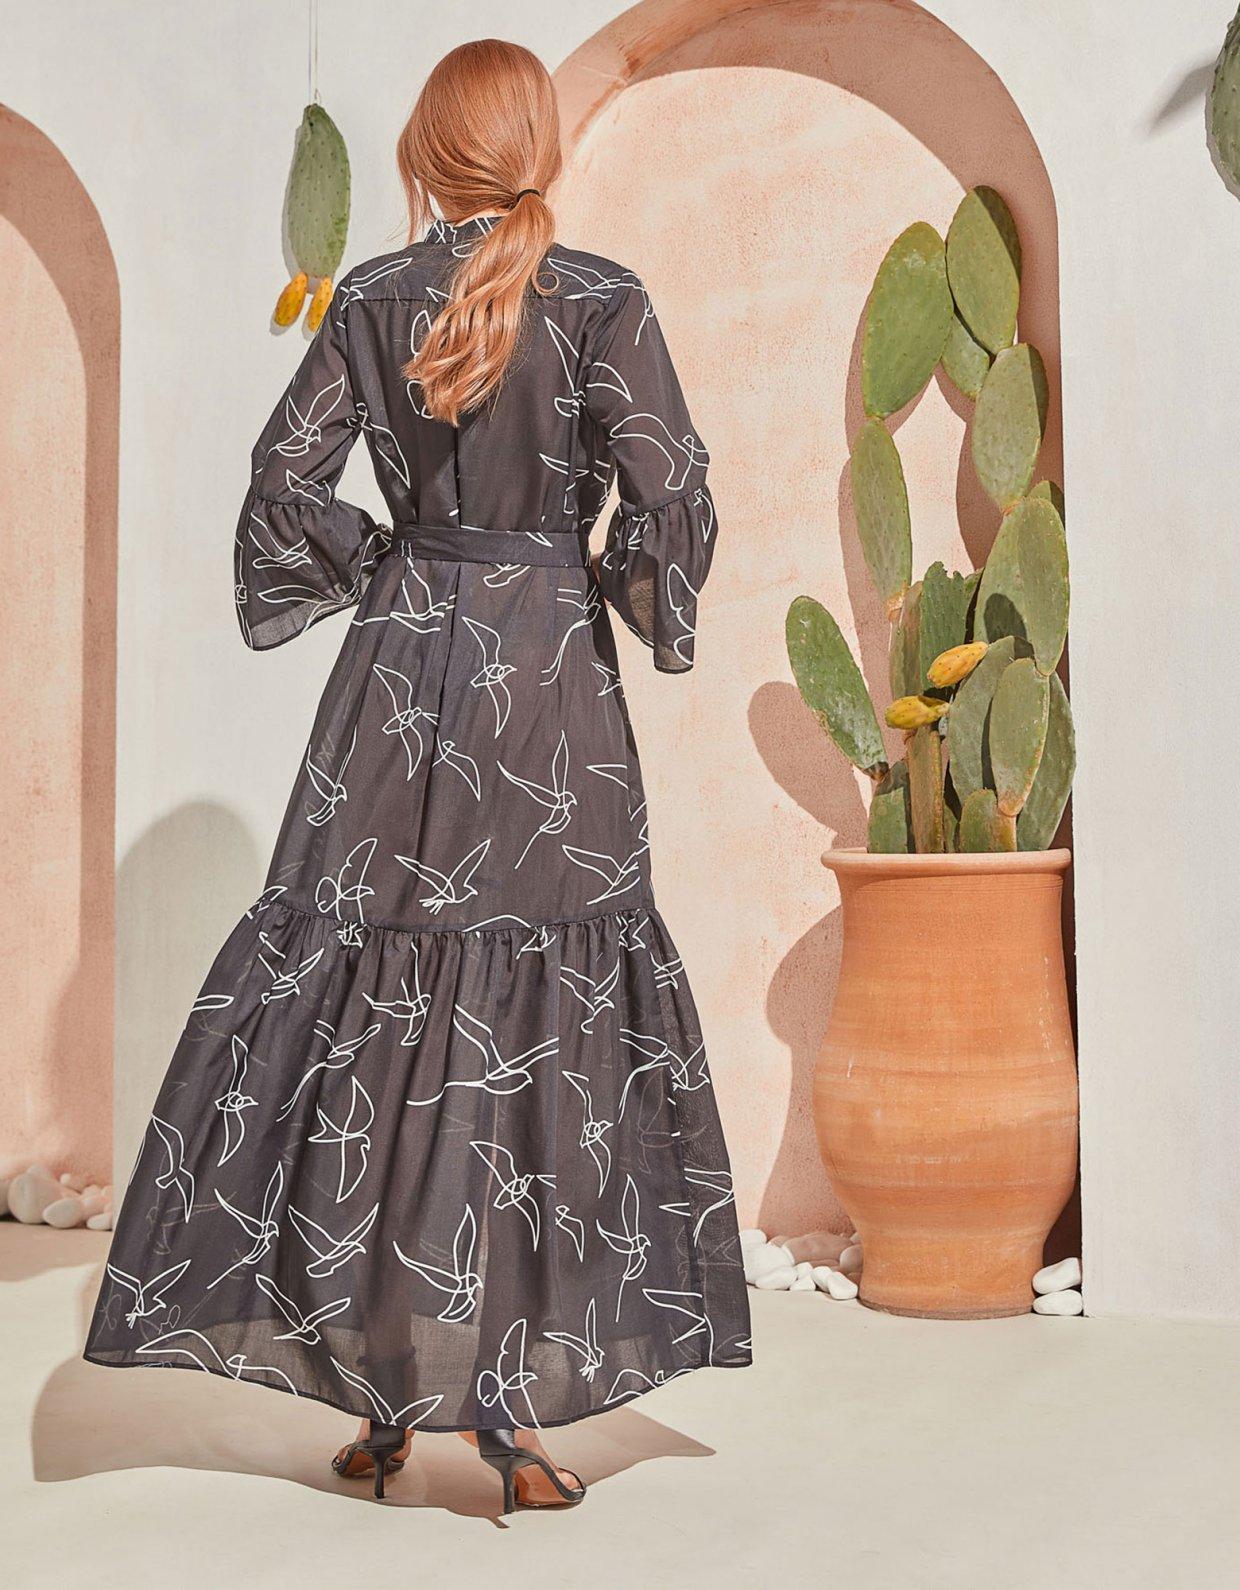 The Knl's Sway maxi dress black birds